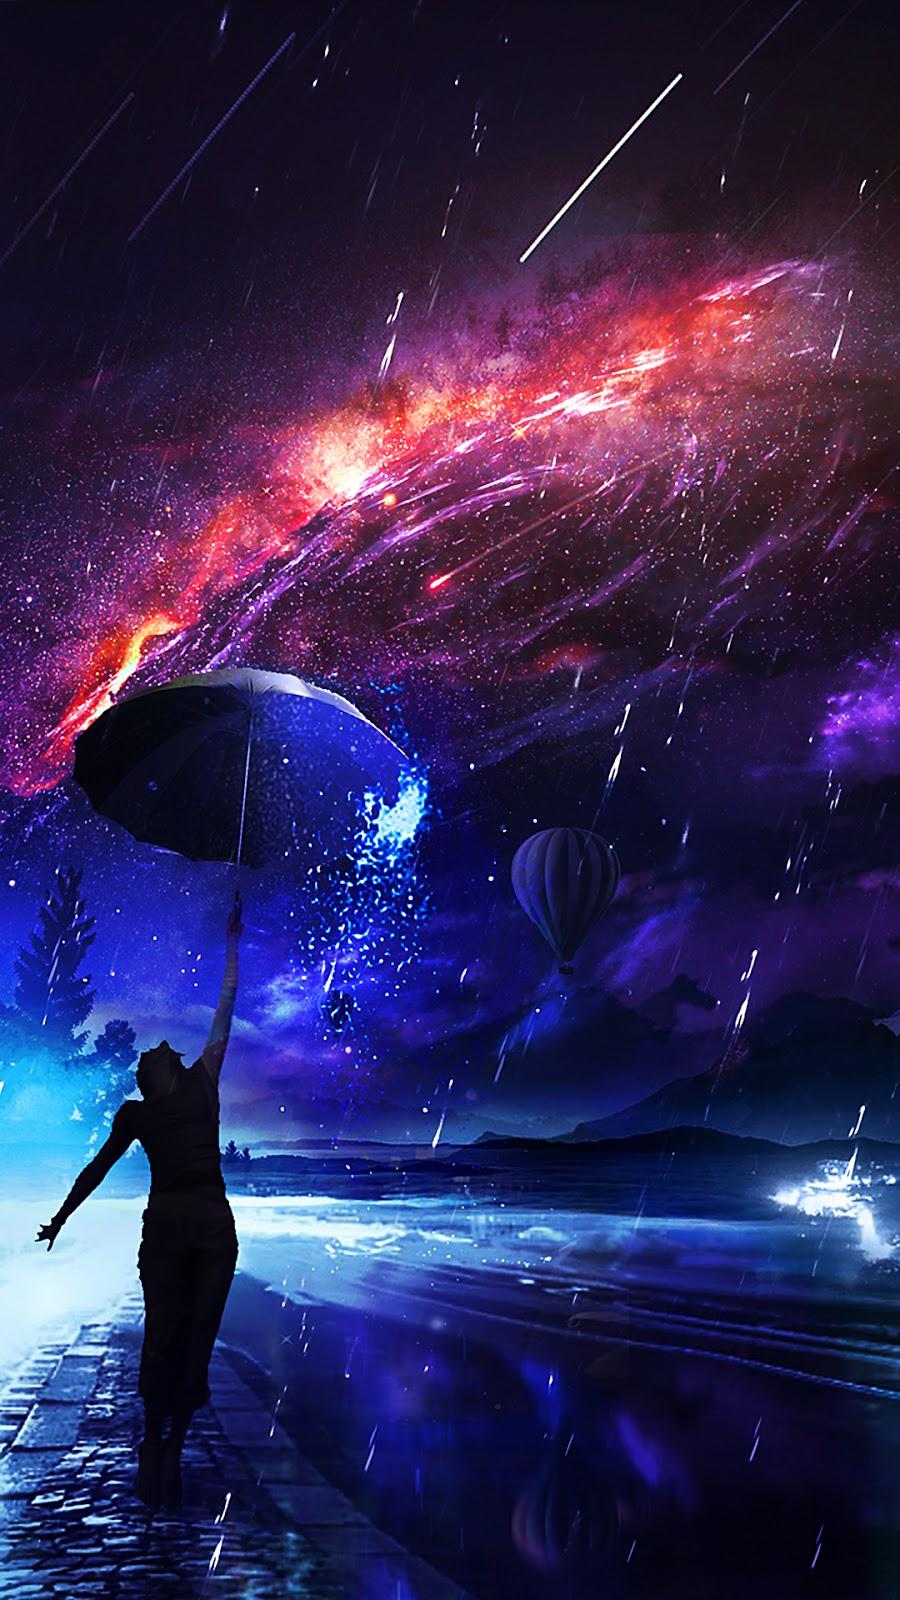 Universe rain